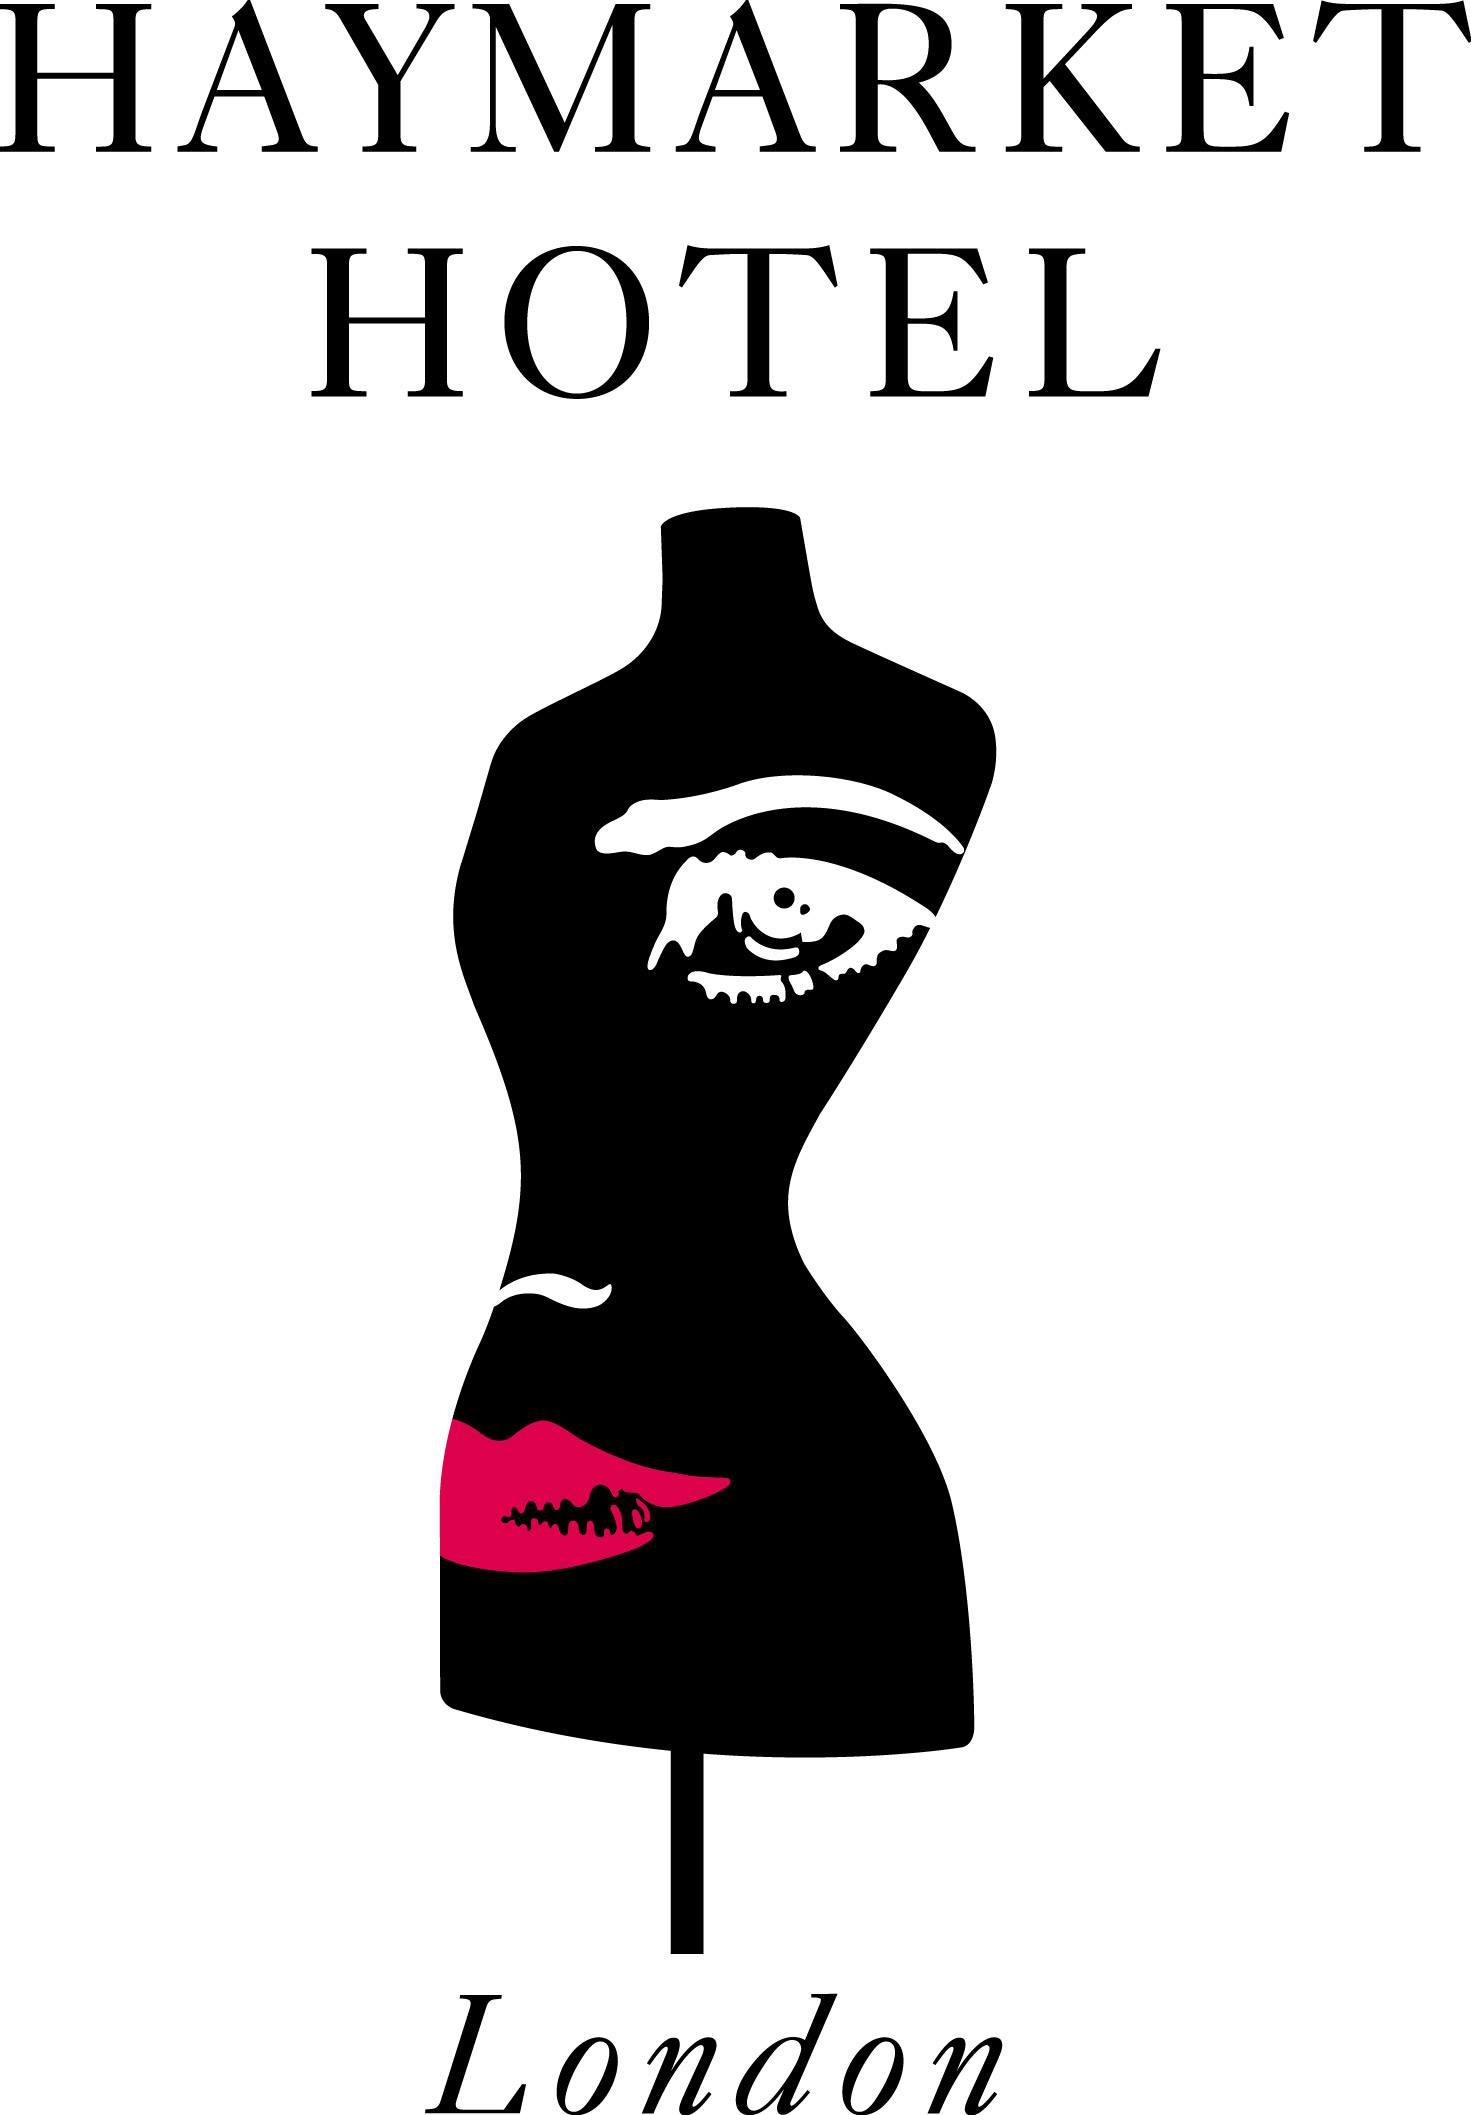 Haymarket Hotel's logo